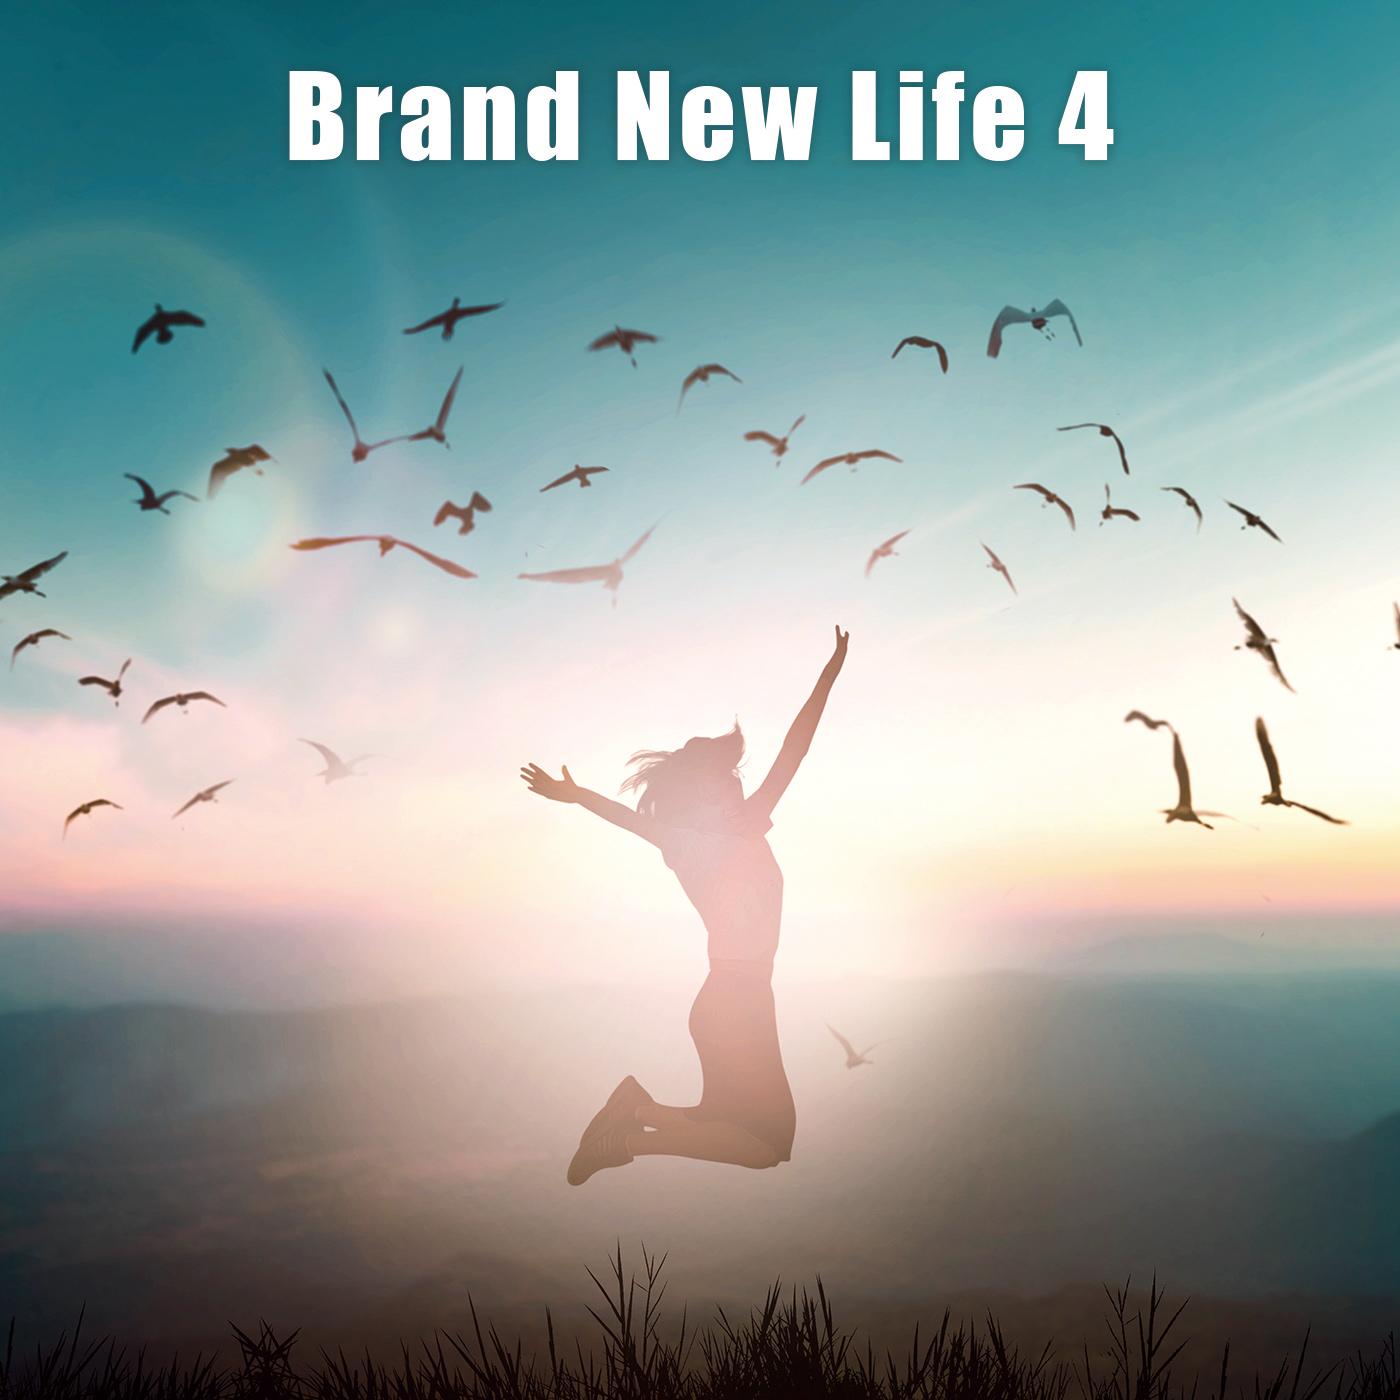 Brand New Life 4